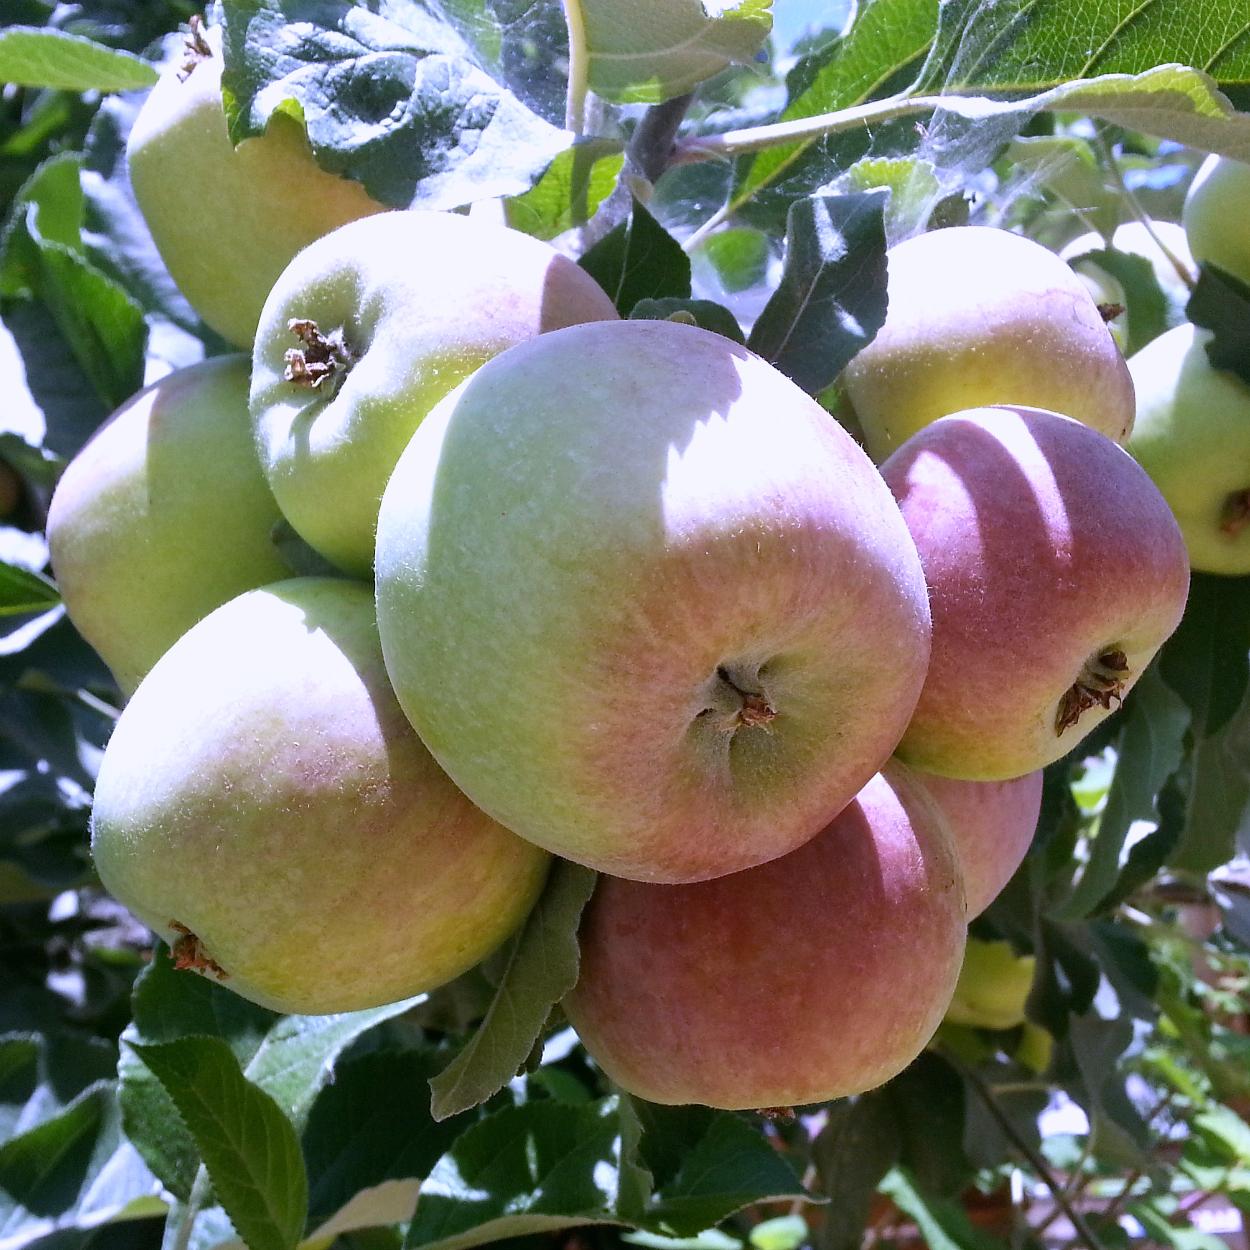 insta ripe apples on a tree